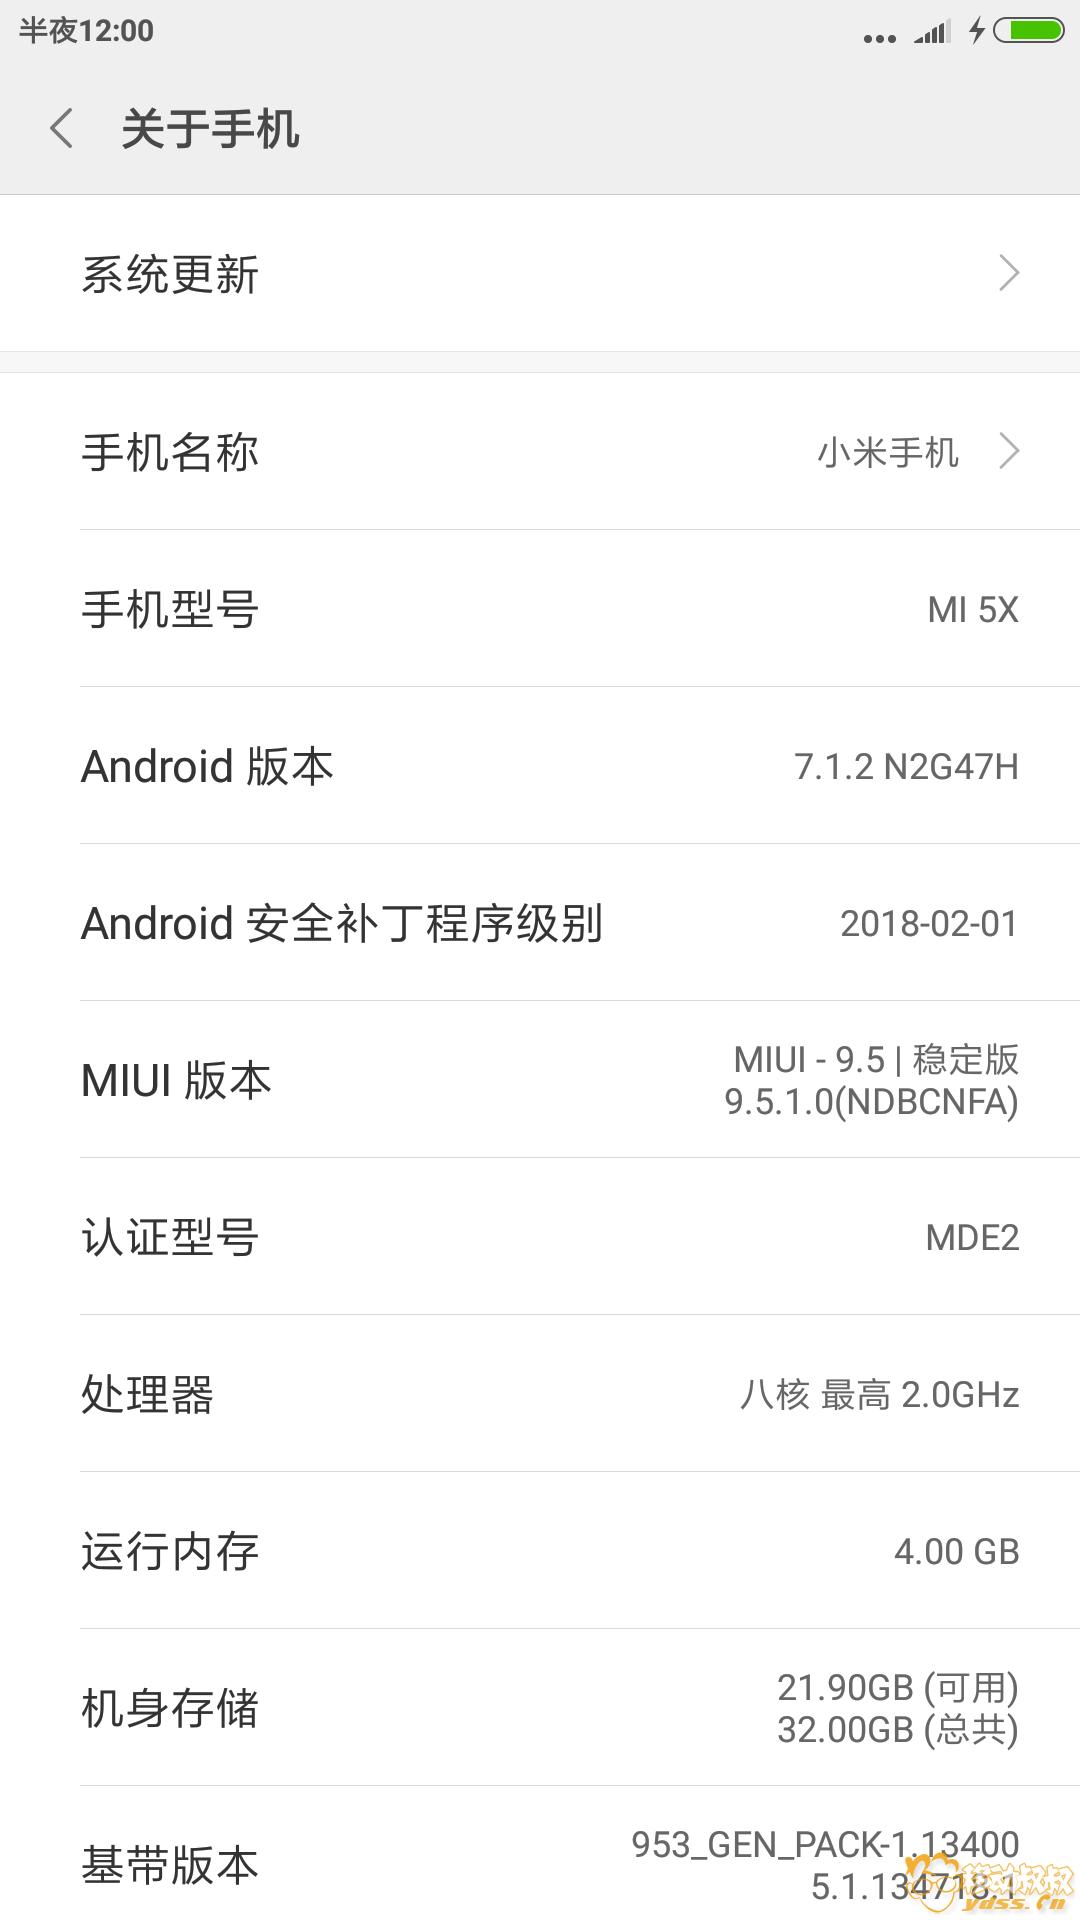 Screenshot_2018-04-15-00-00-07-324_com.android.settings.png